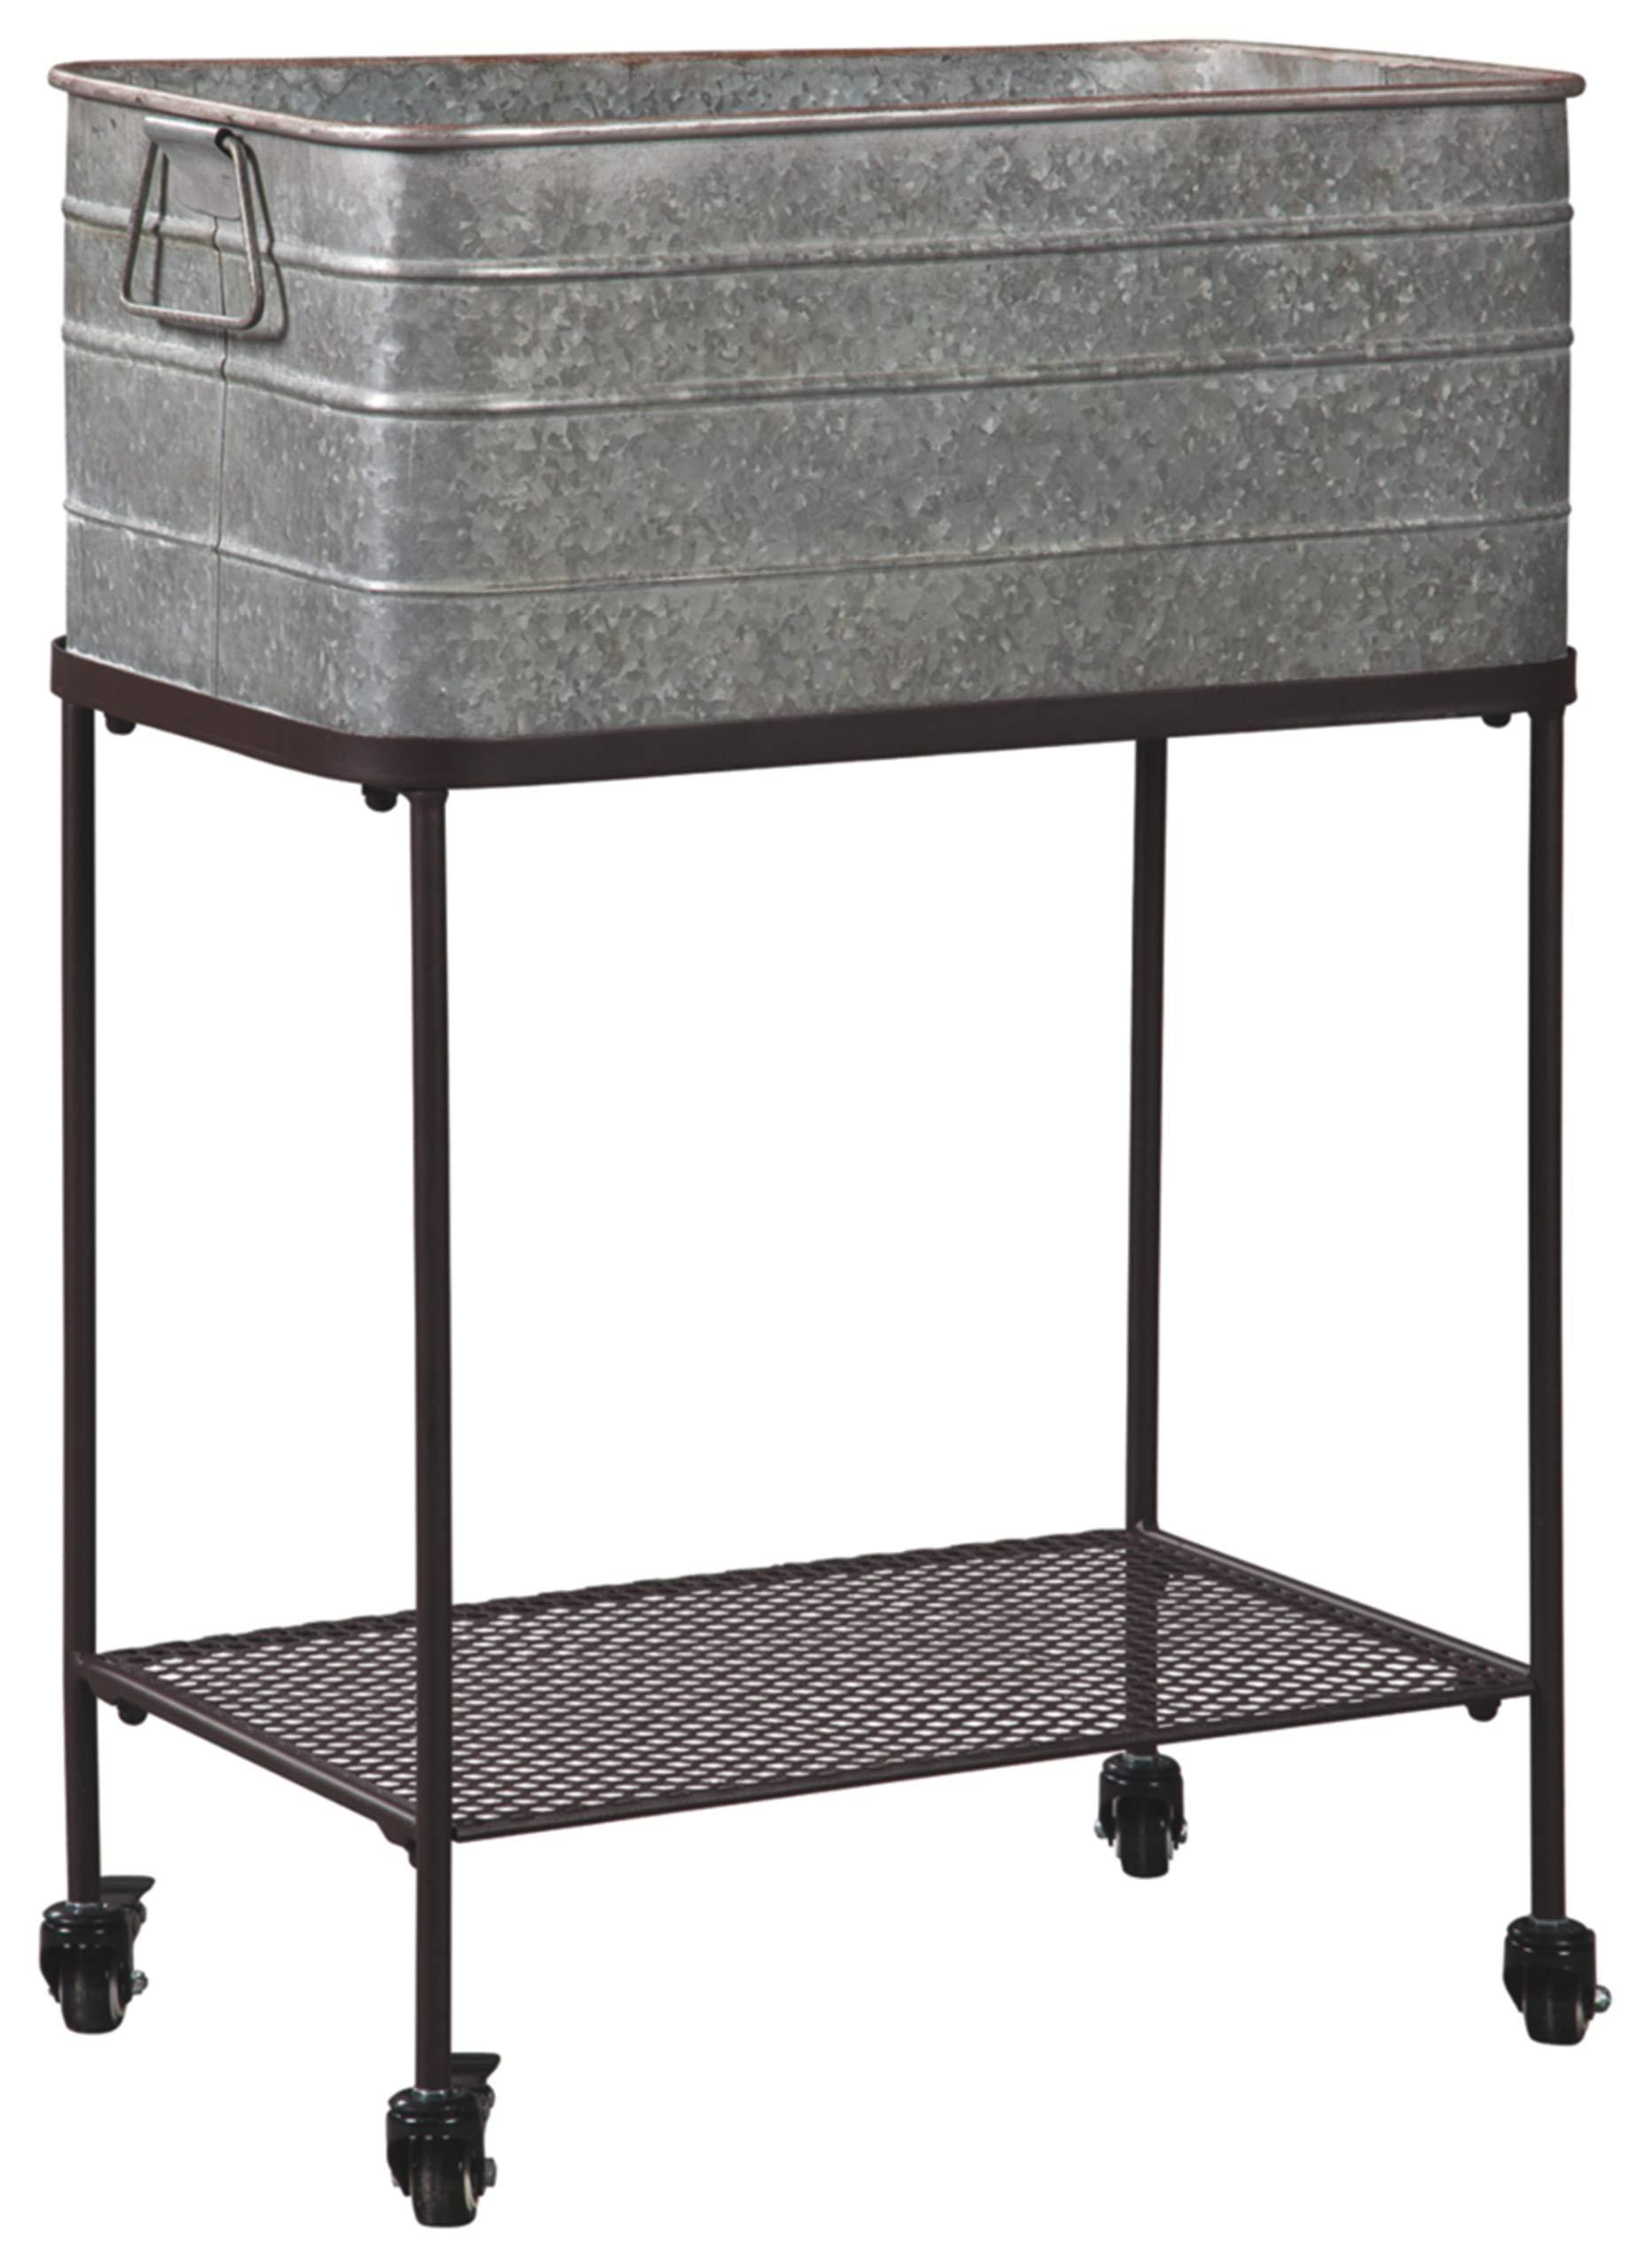 Ashley Furniture Signature Design - Vossman Beverage Tub - Antique Gray/Brown